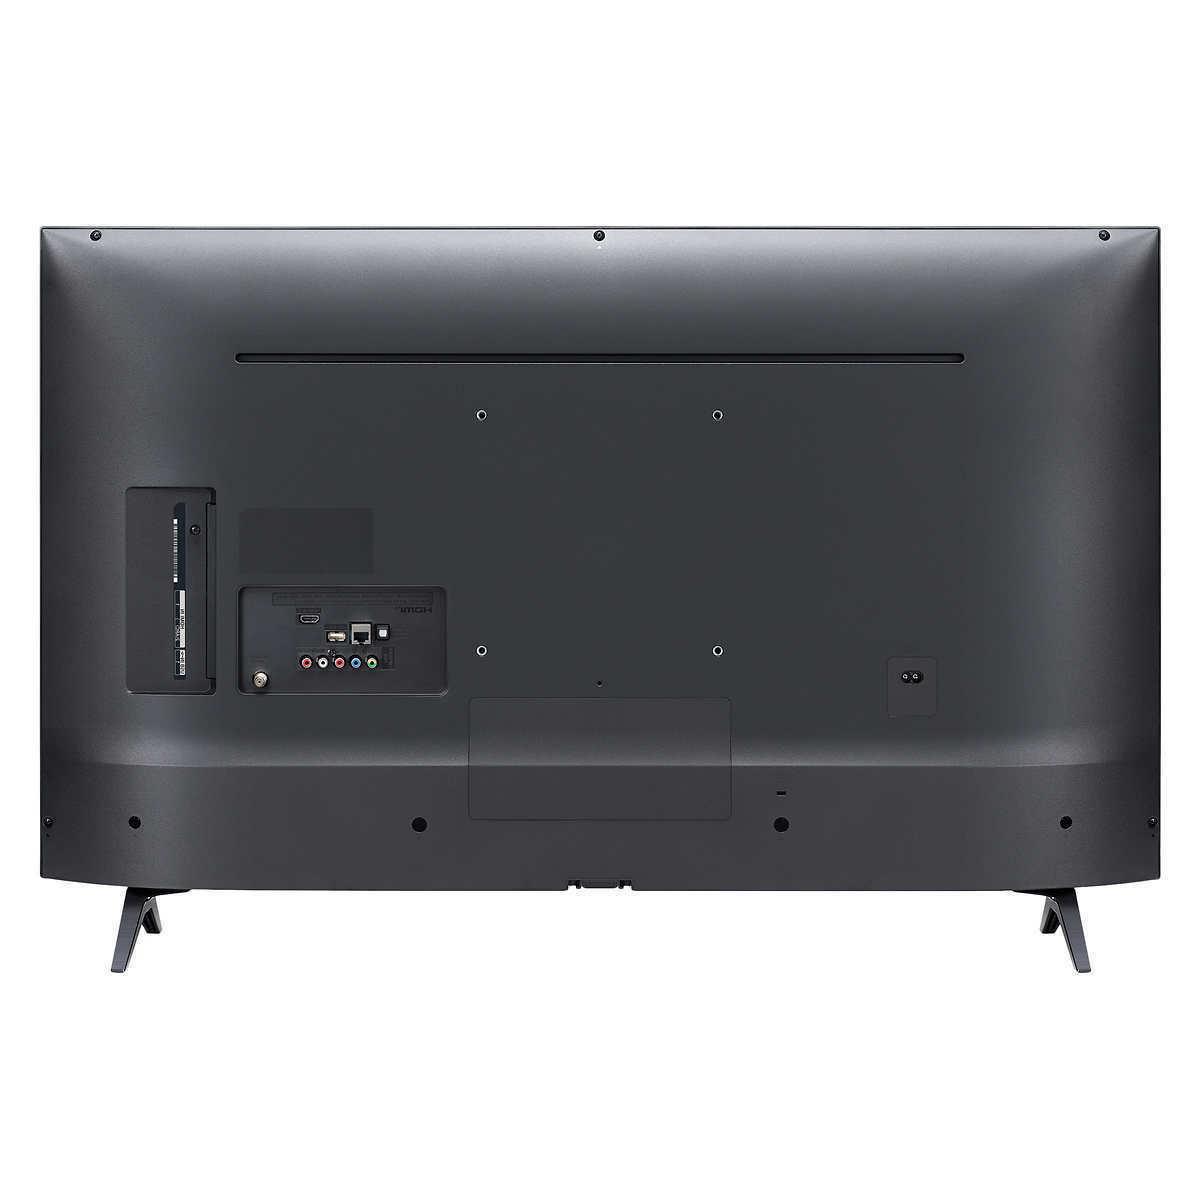 UN7300 Series - 4K UHD LED